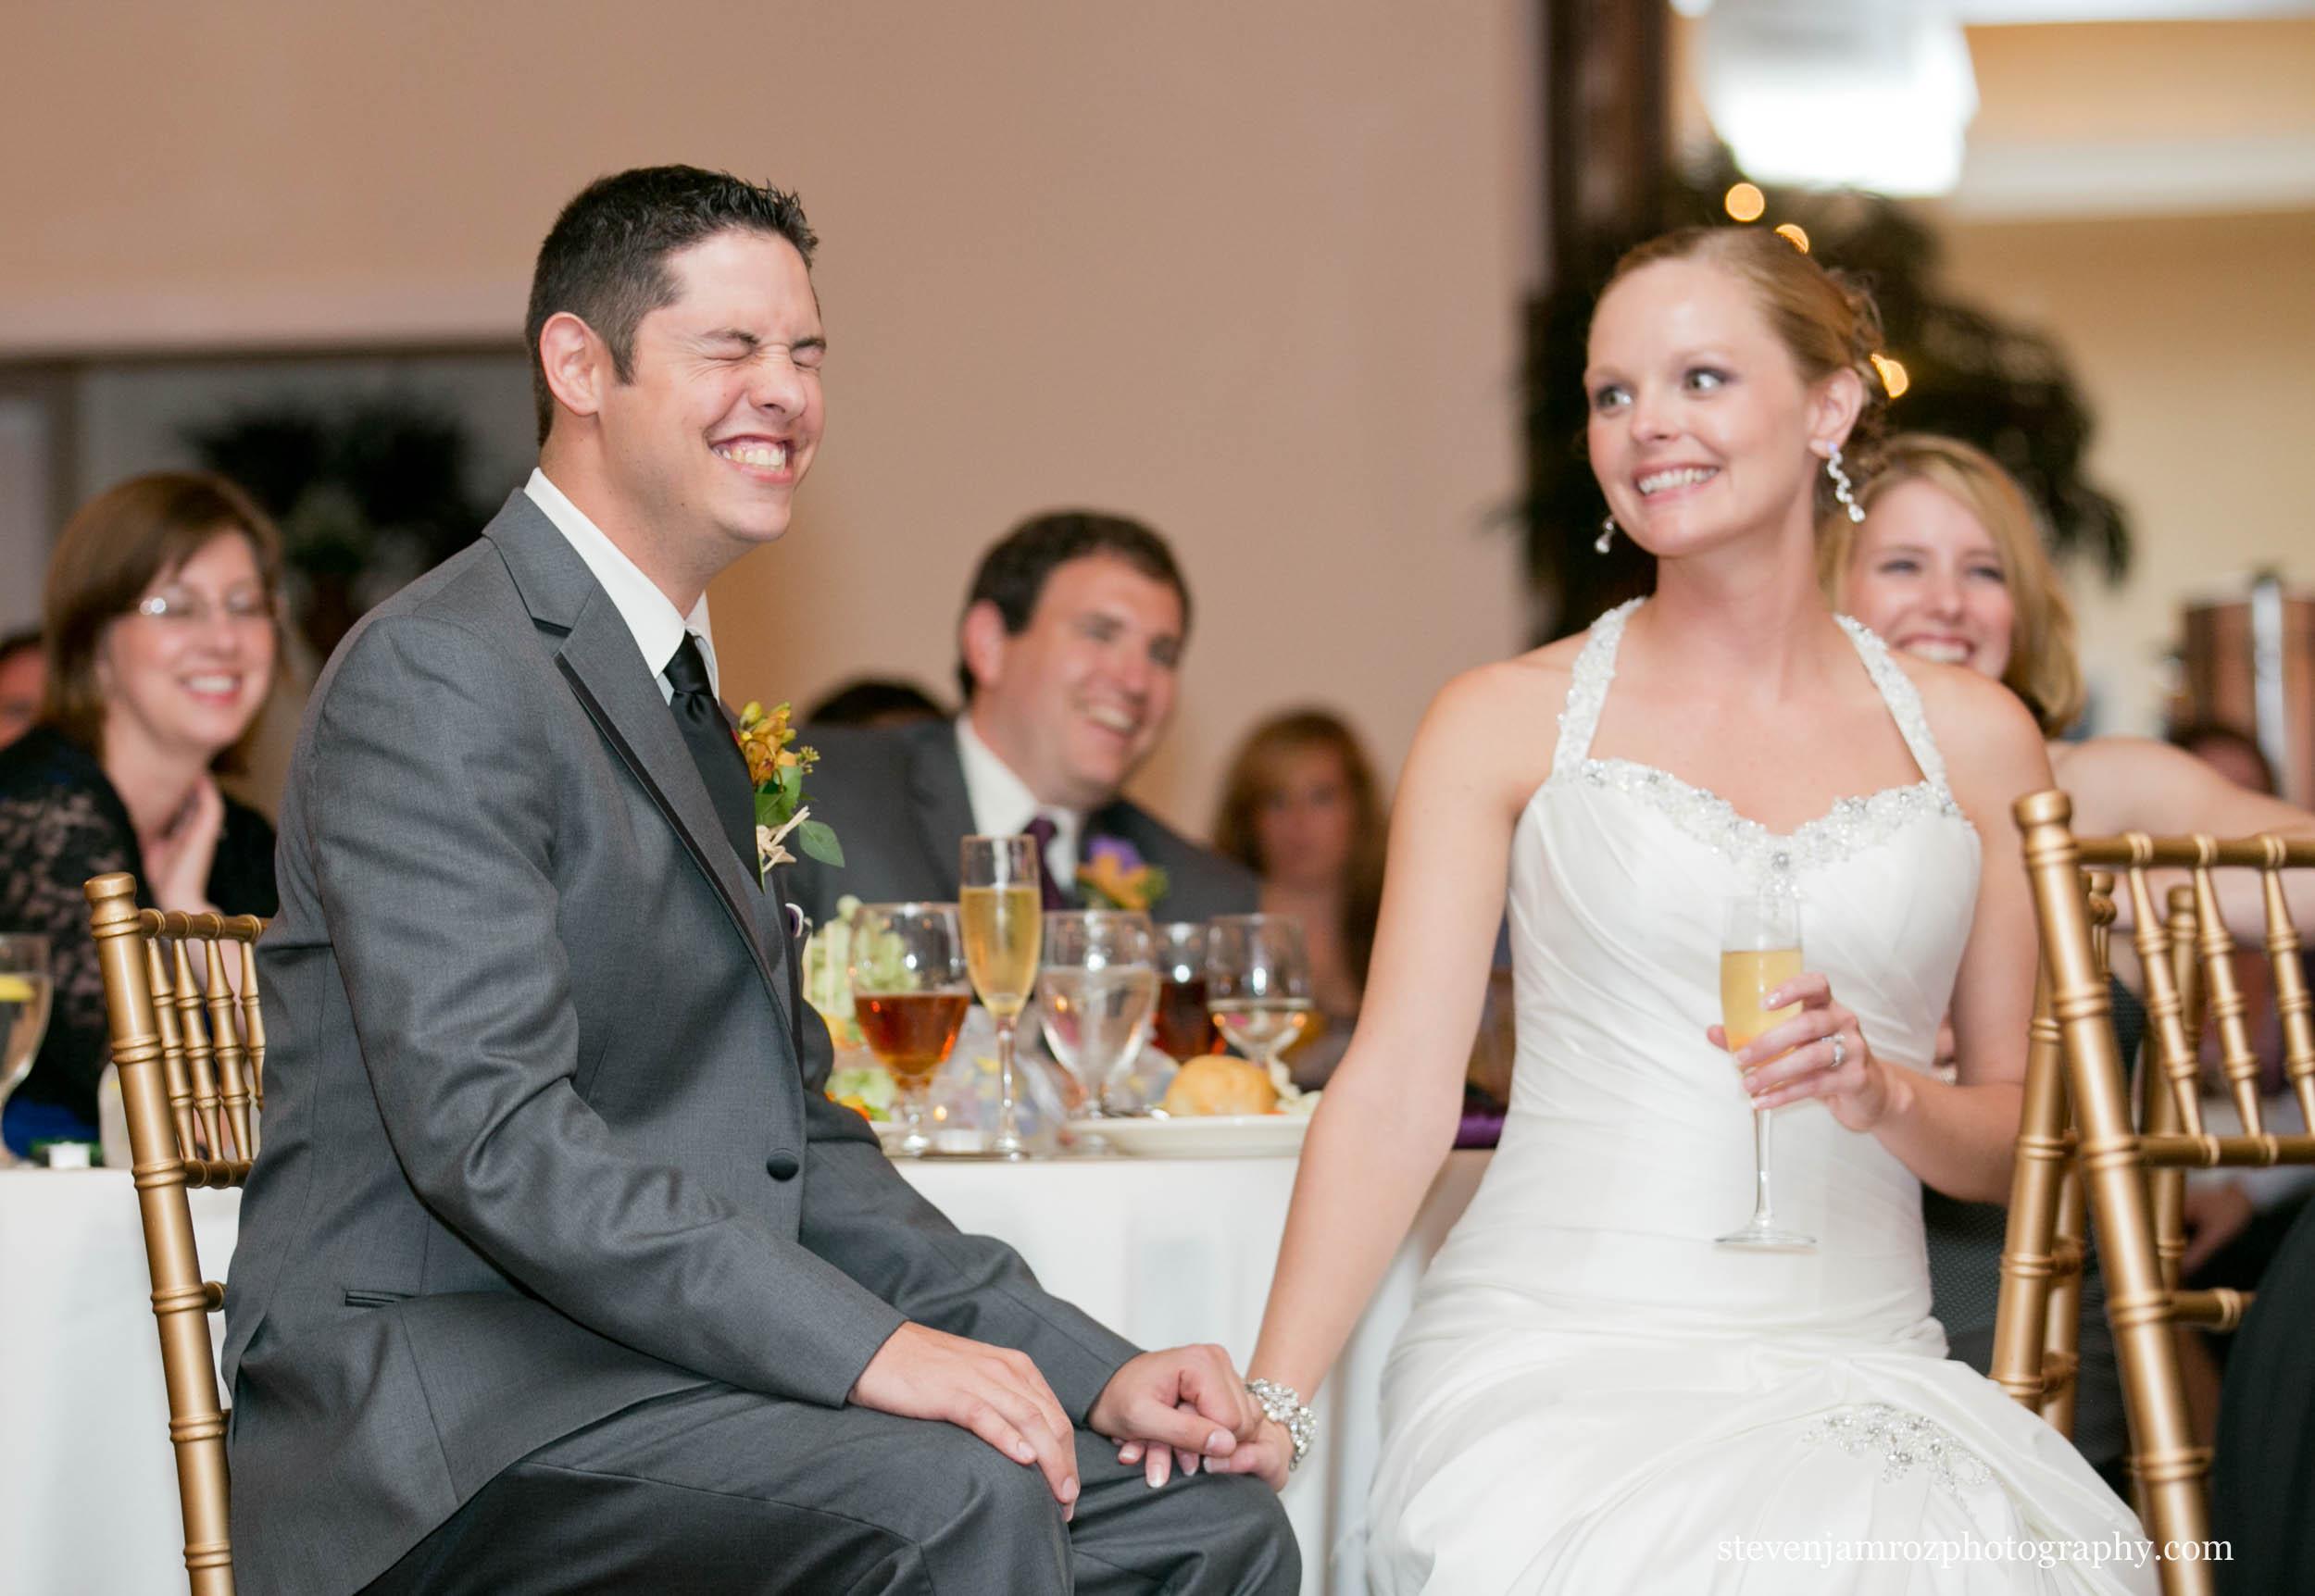 photojournalism-wedding-reception-raleigh-nc-steven-jamroz-photography-0046.jpg